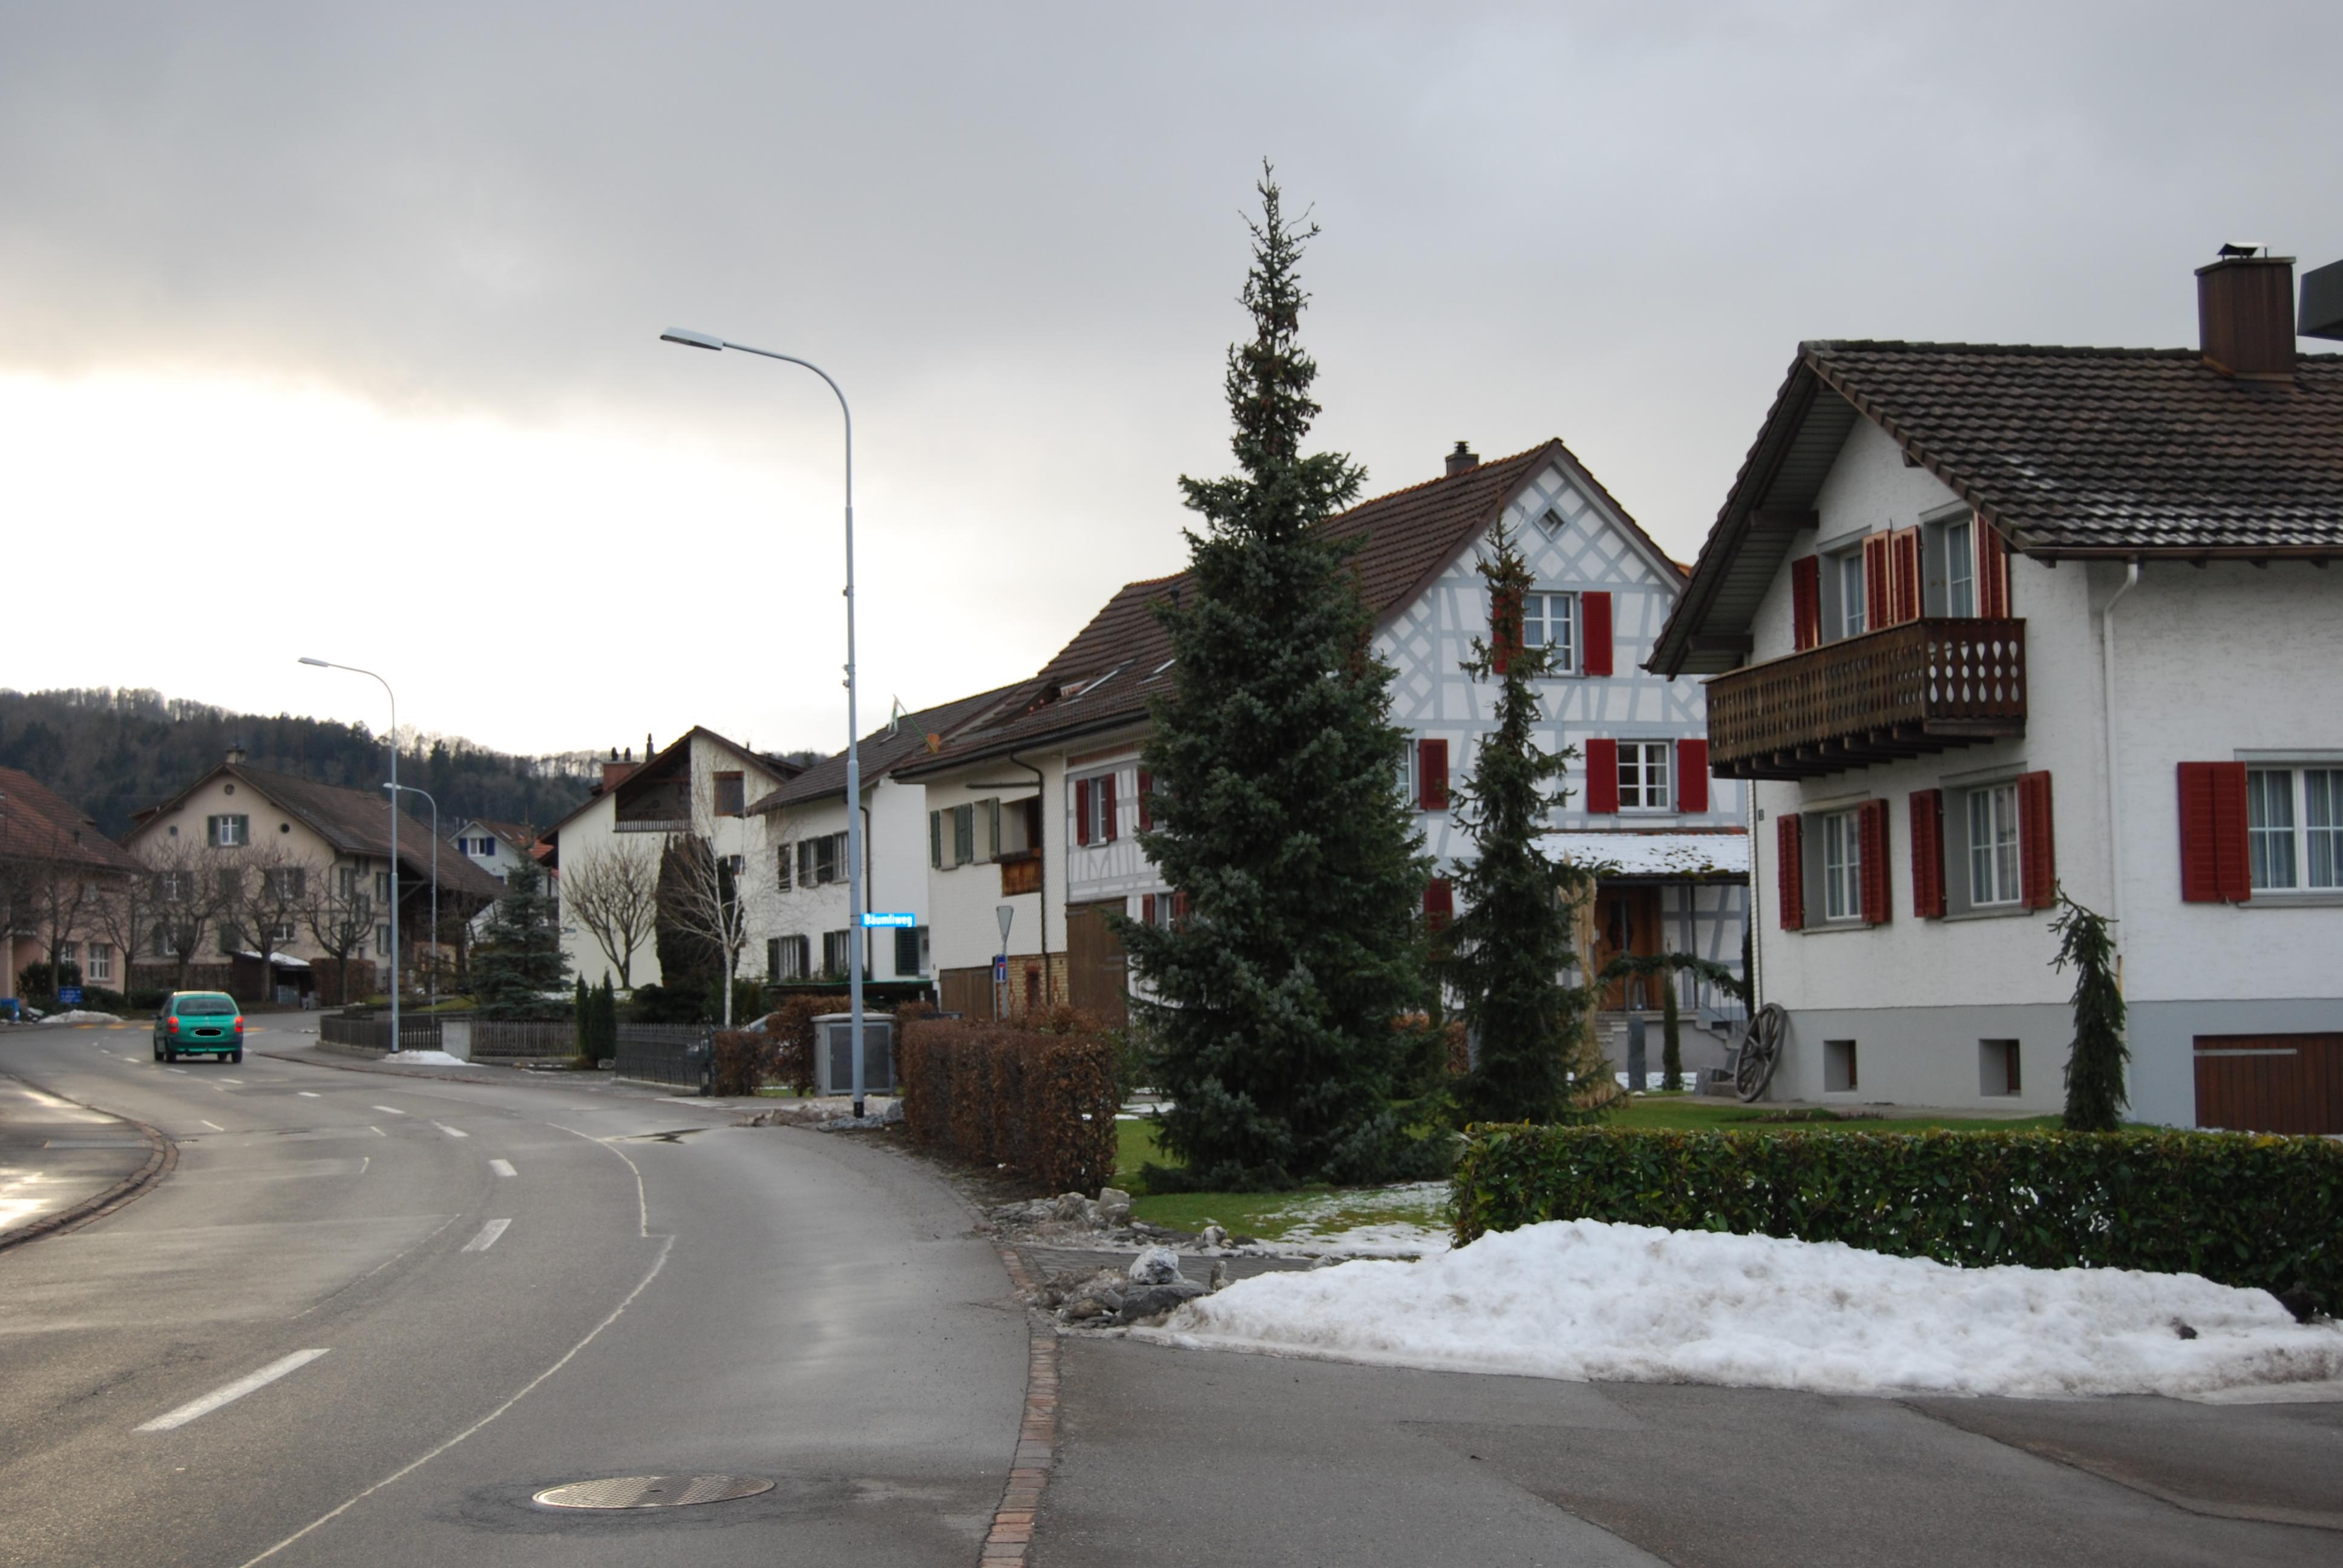 File:Ettenhausen (municipality of Aadorf) 133.jpg - Wikimedia Commons